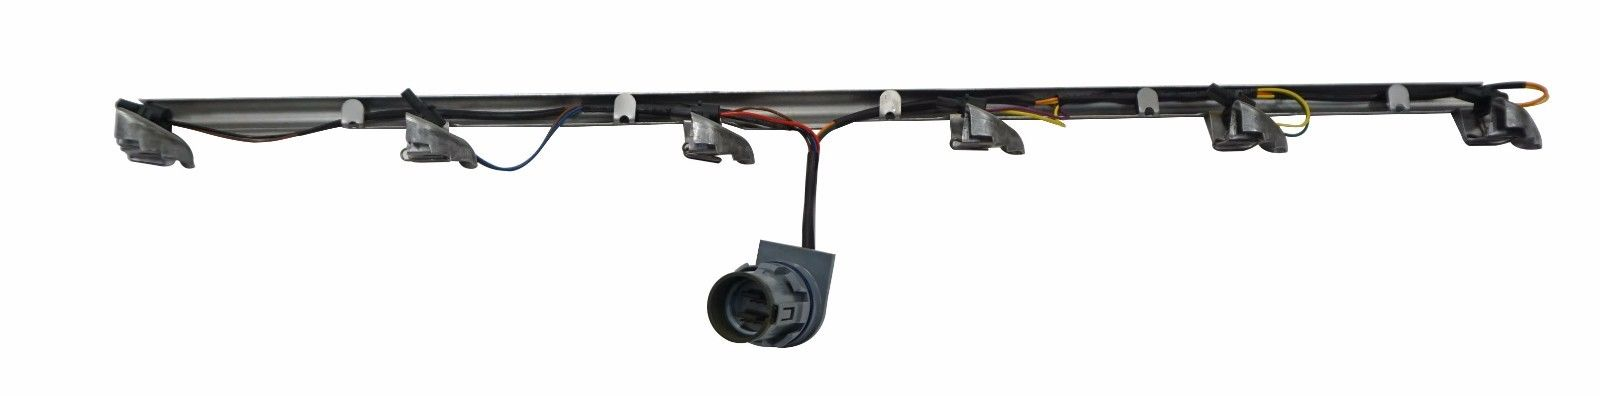 Injector Harness For Navistar International DT466 DT530 DT466E 1889905C92 302948320711 7 6l 8 7l 94 03 international navistar dt466 dt530 dt466e injector